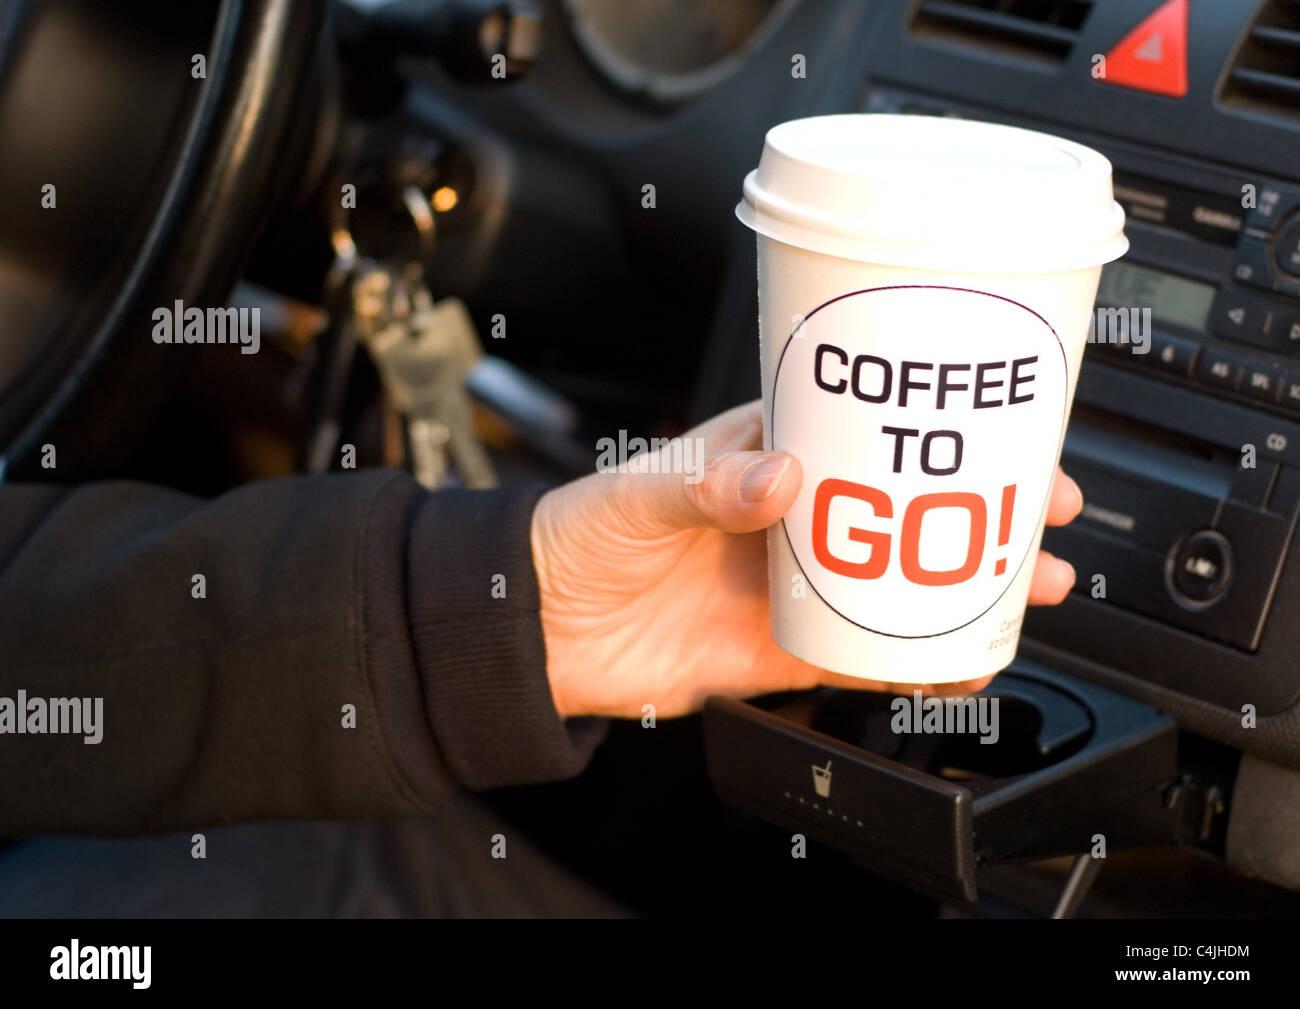 coffee to go - Stock Image